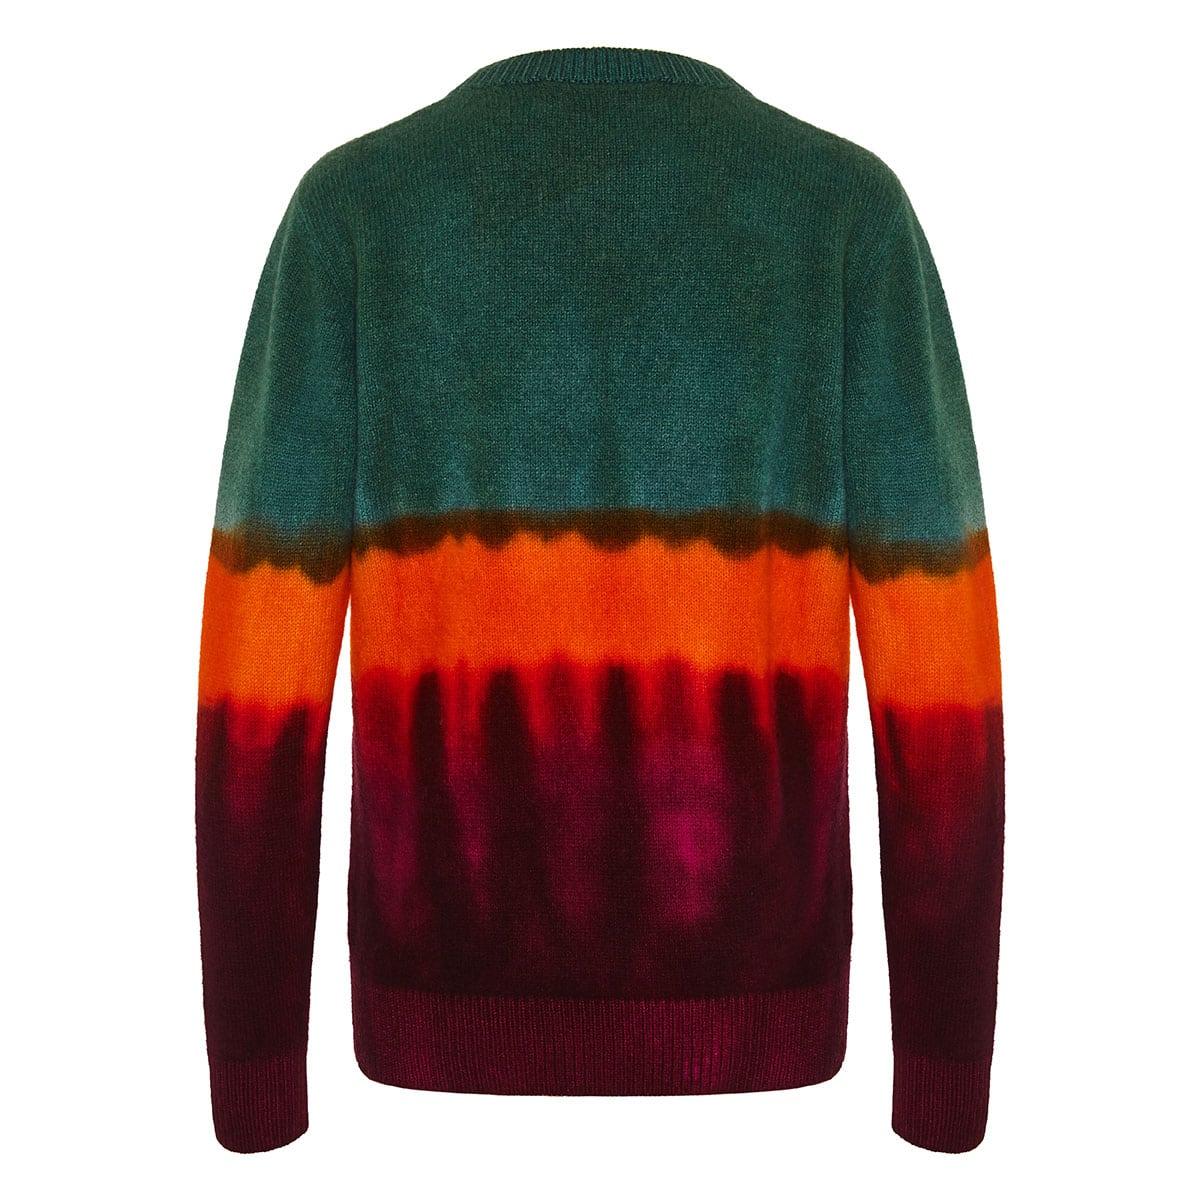 Tie dye cashmere sweater